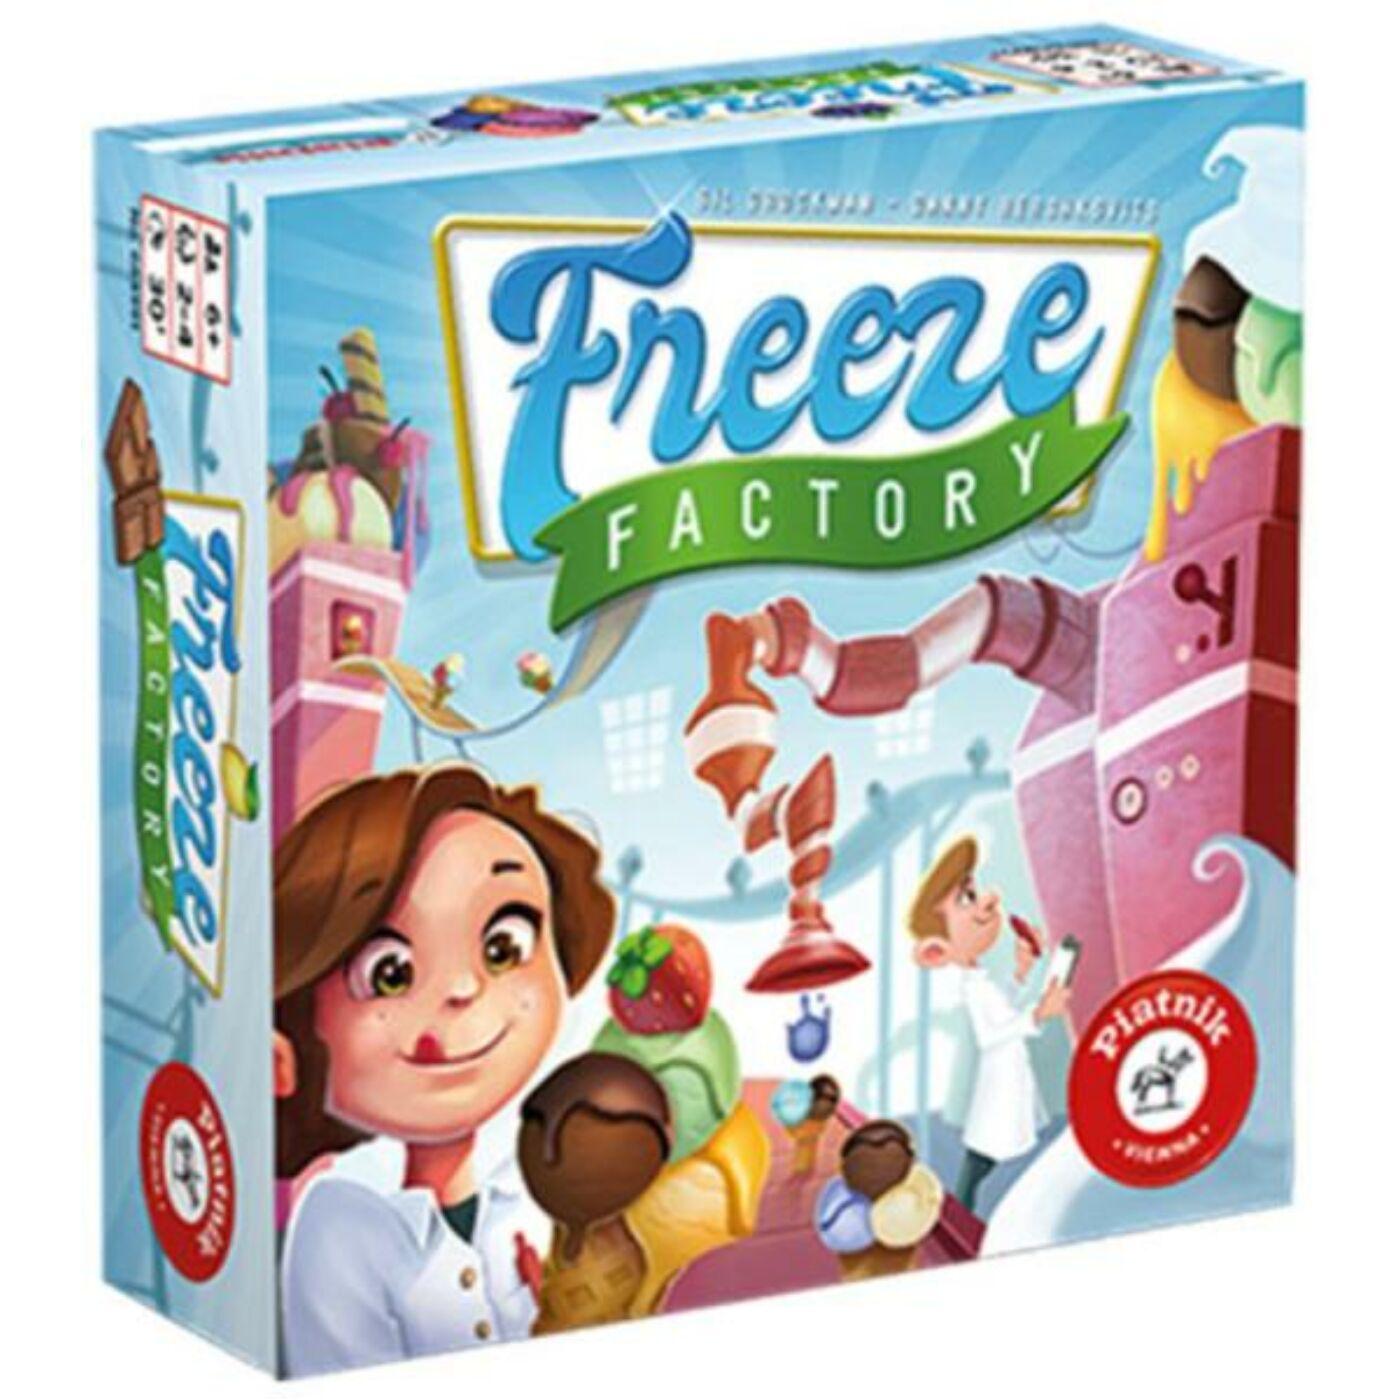 Freeze Factory